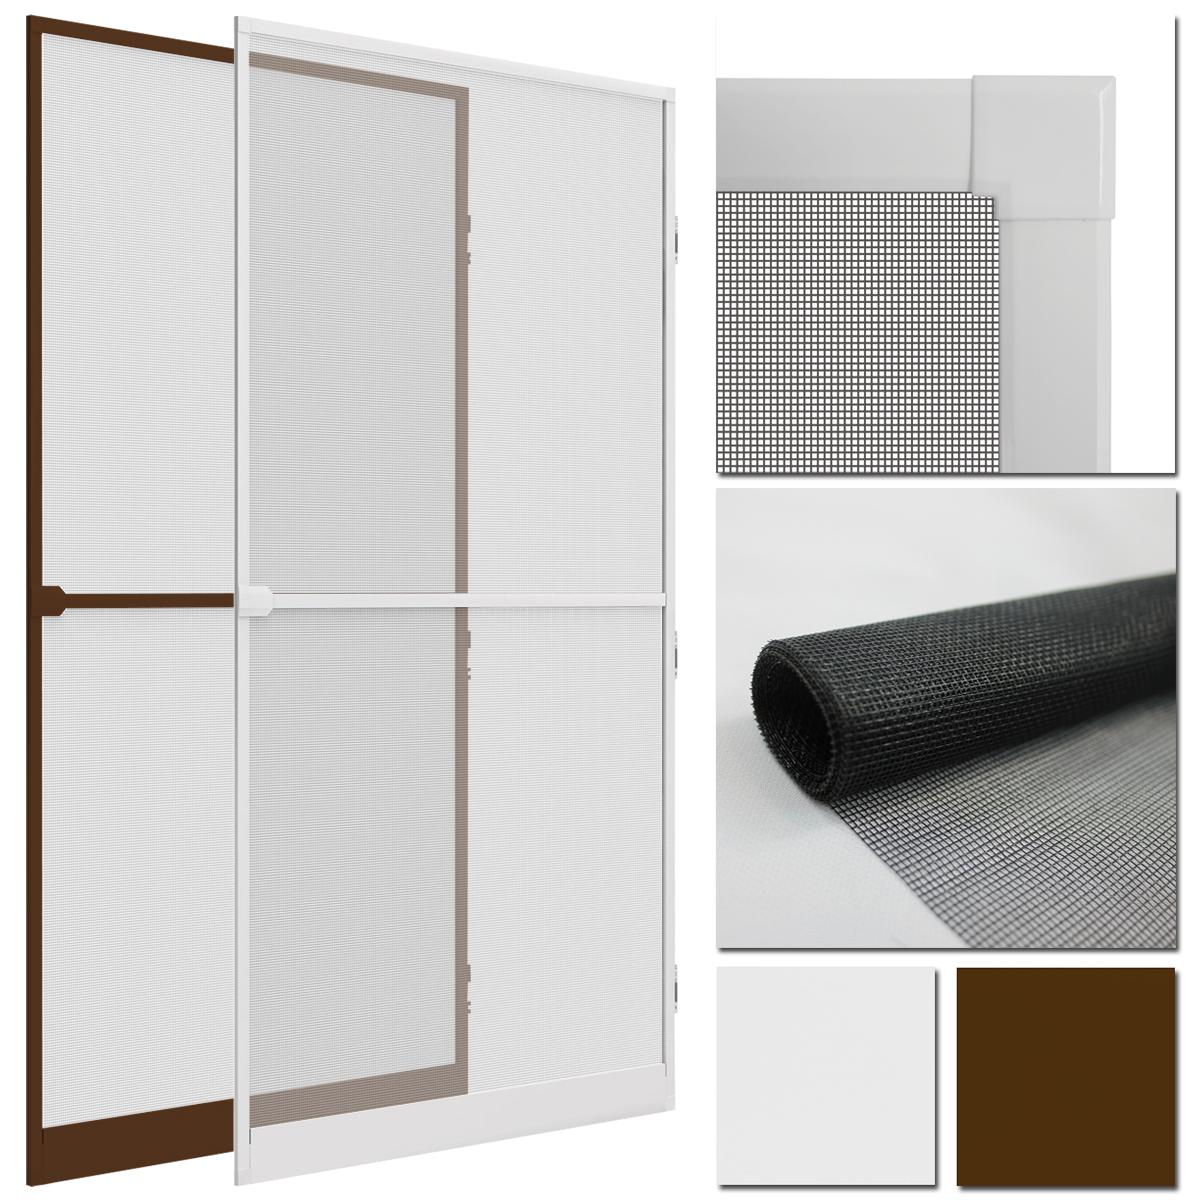 insektenschutz t r comfort xxl 120x240 alu rahmen fliegengitter m ckenschutz ebay. Black Bedroom Furniture Sets. Home Design Ideas